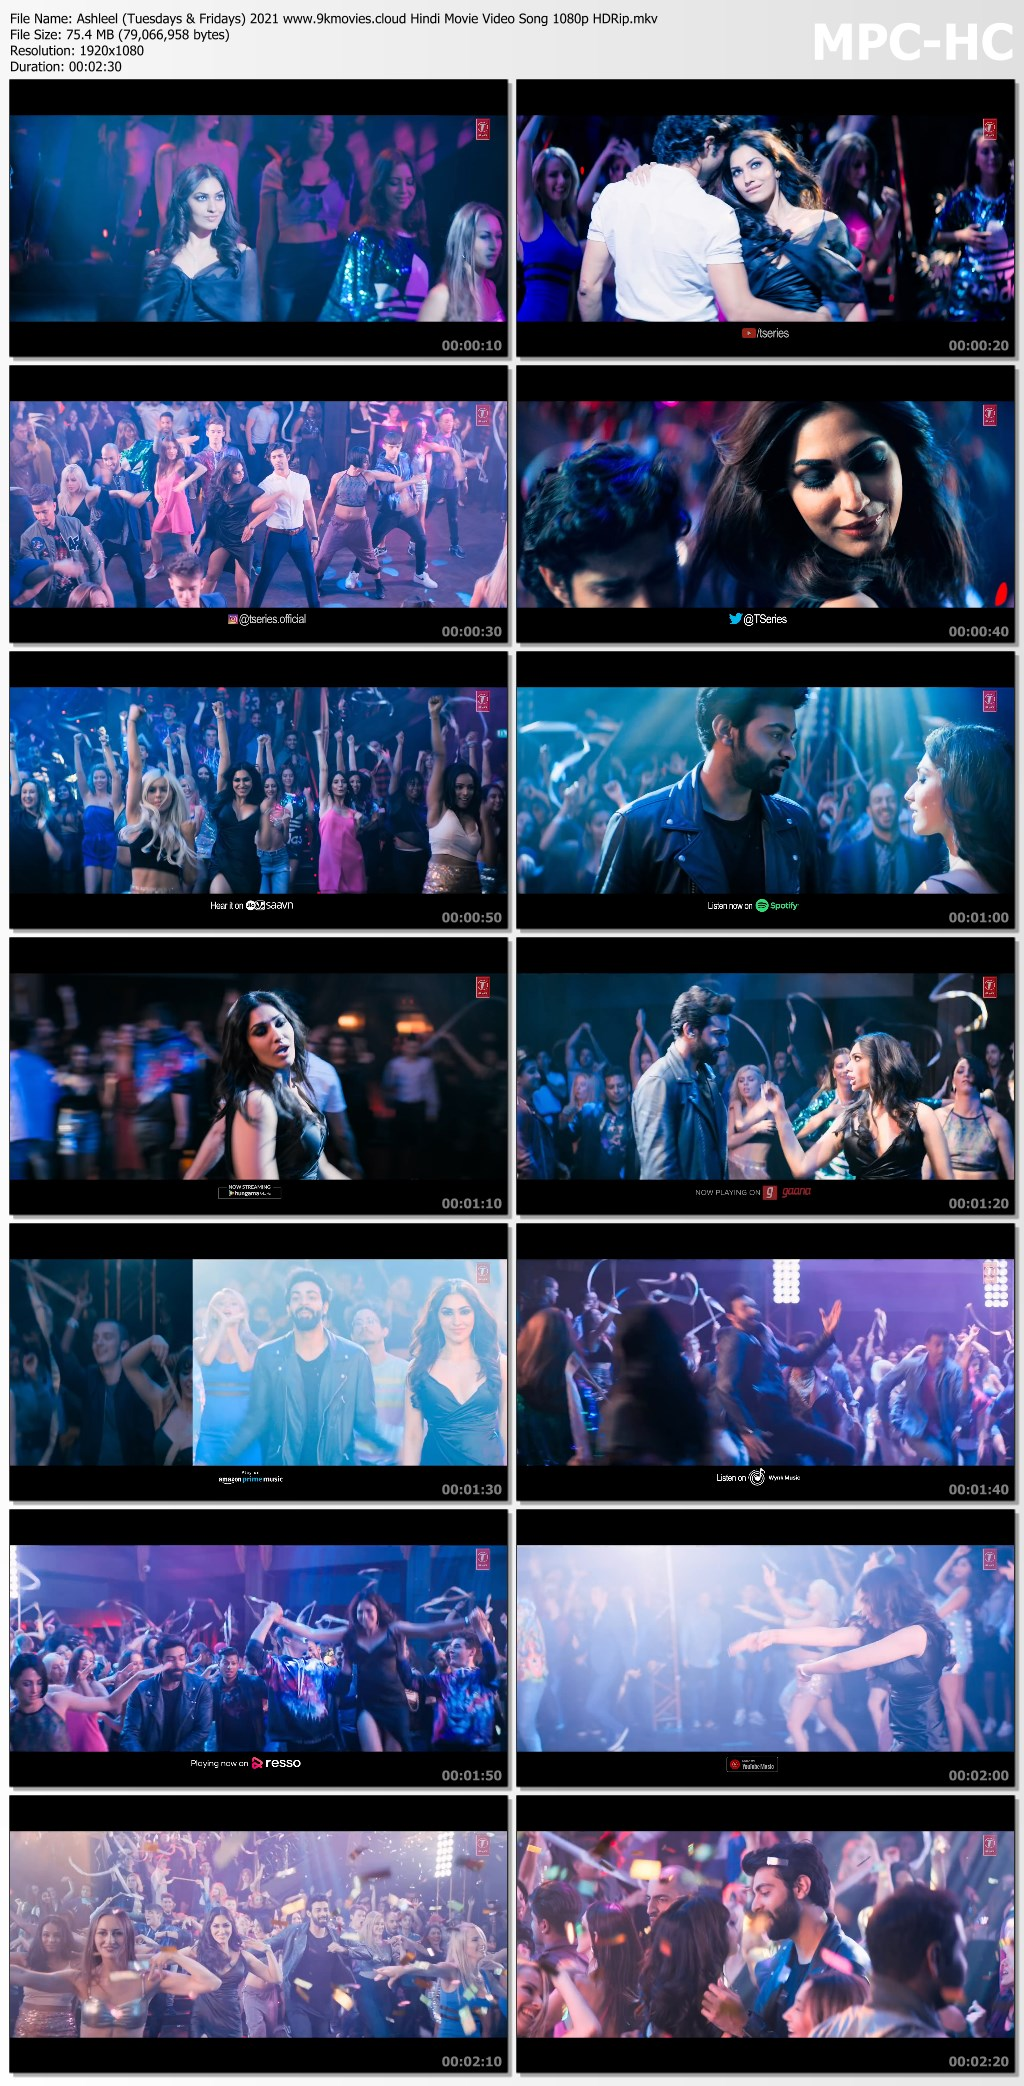 Ashleel (Tuesdays & Fridays) 2021 Hindi Movie Video Song ...